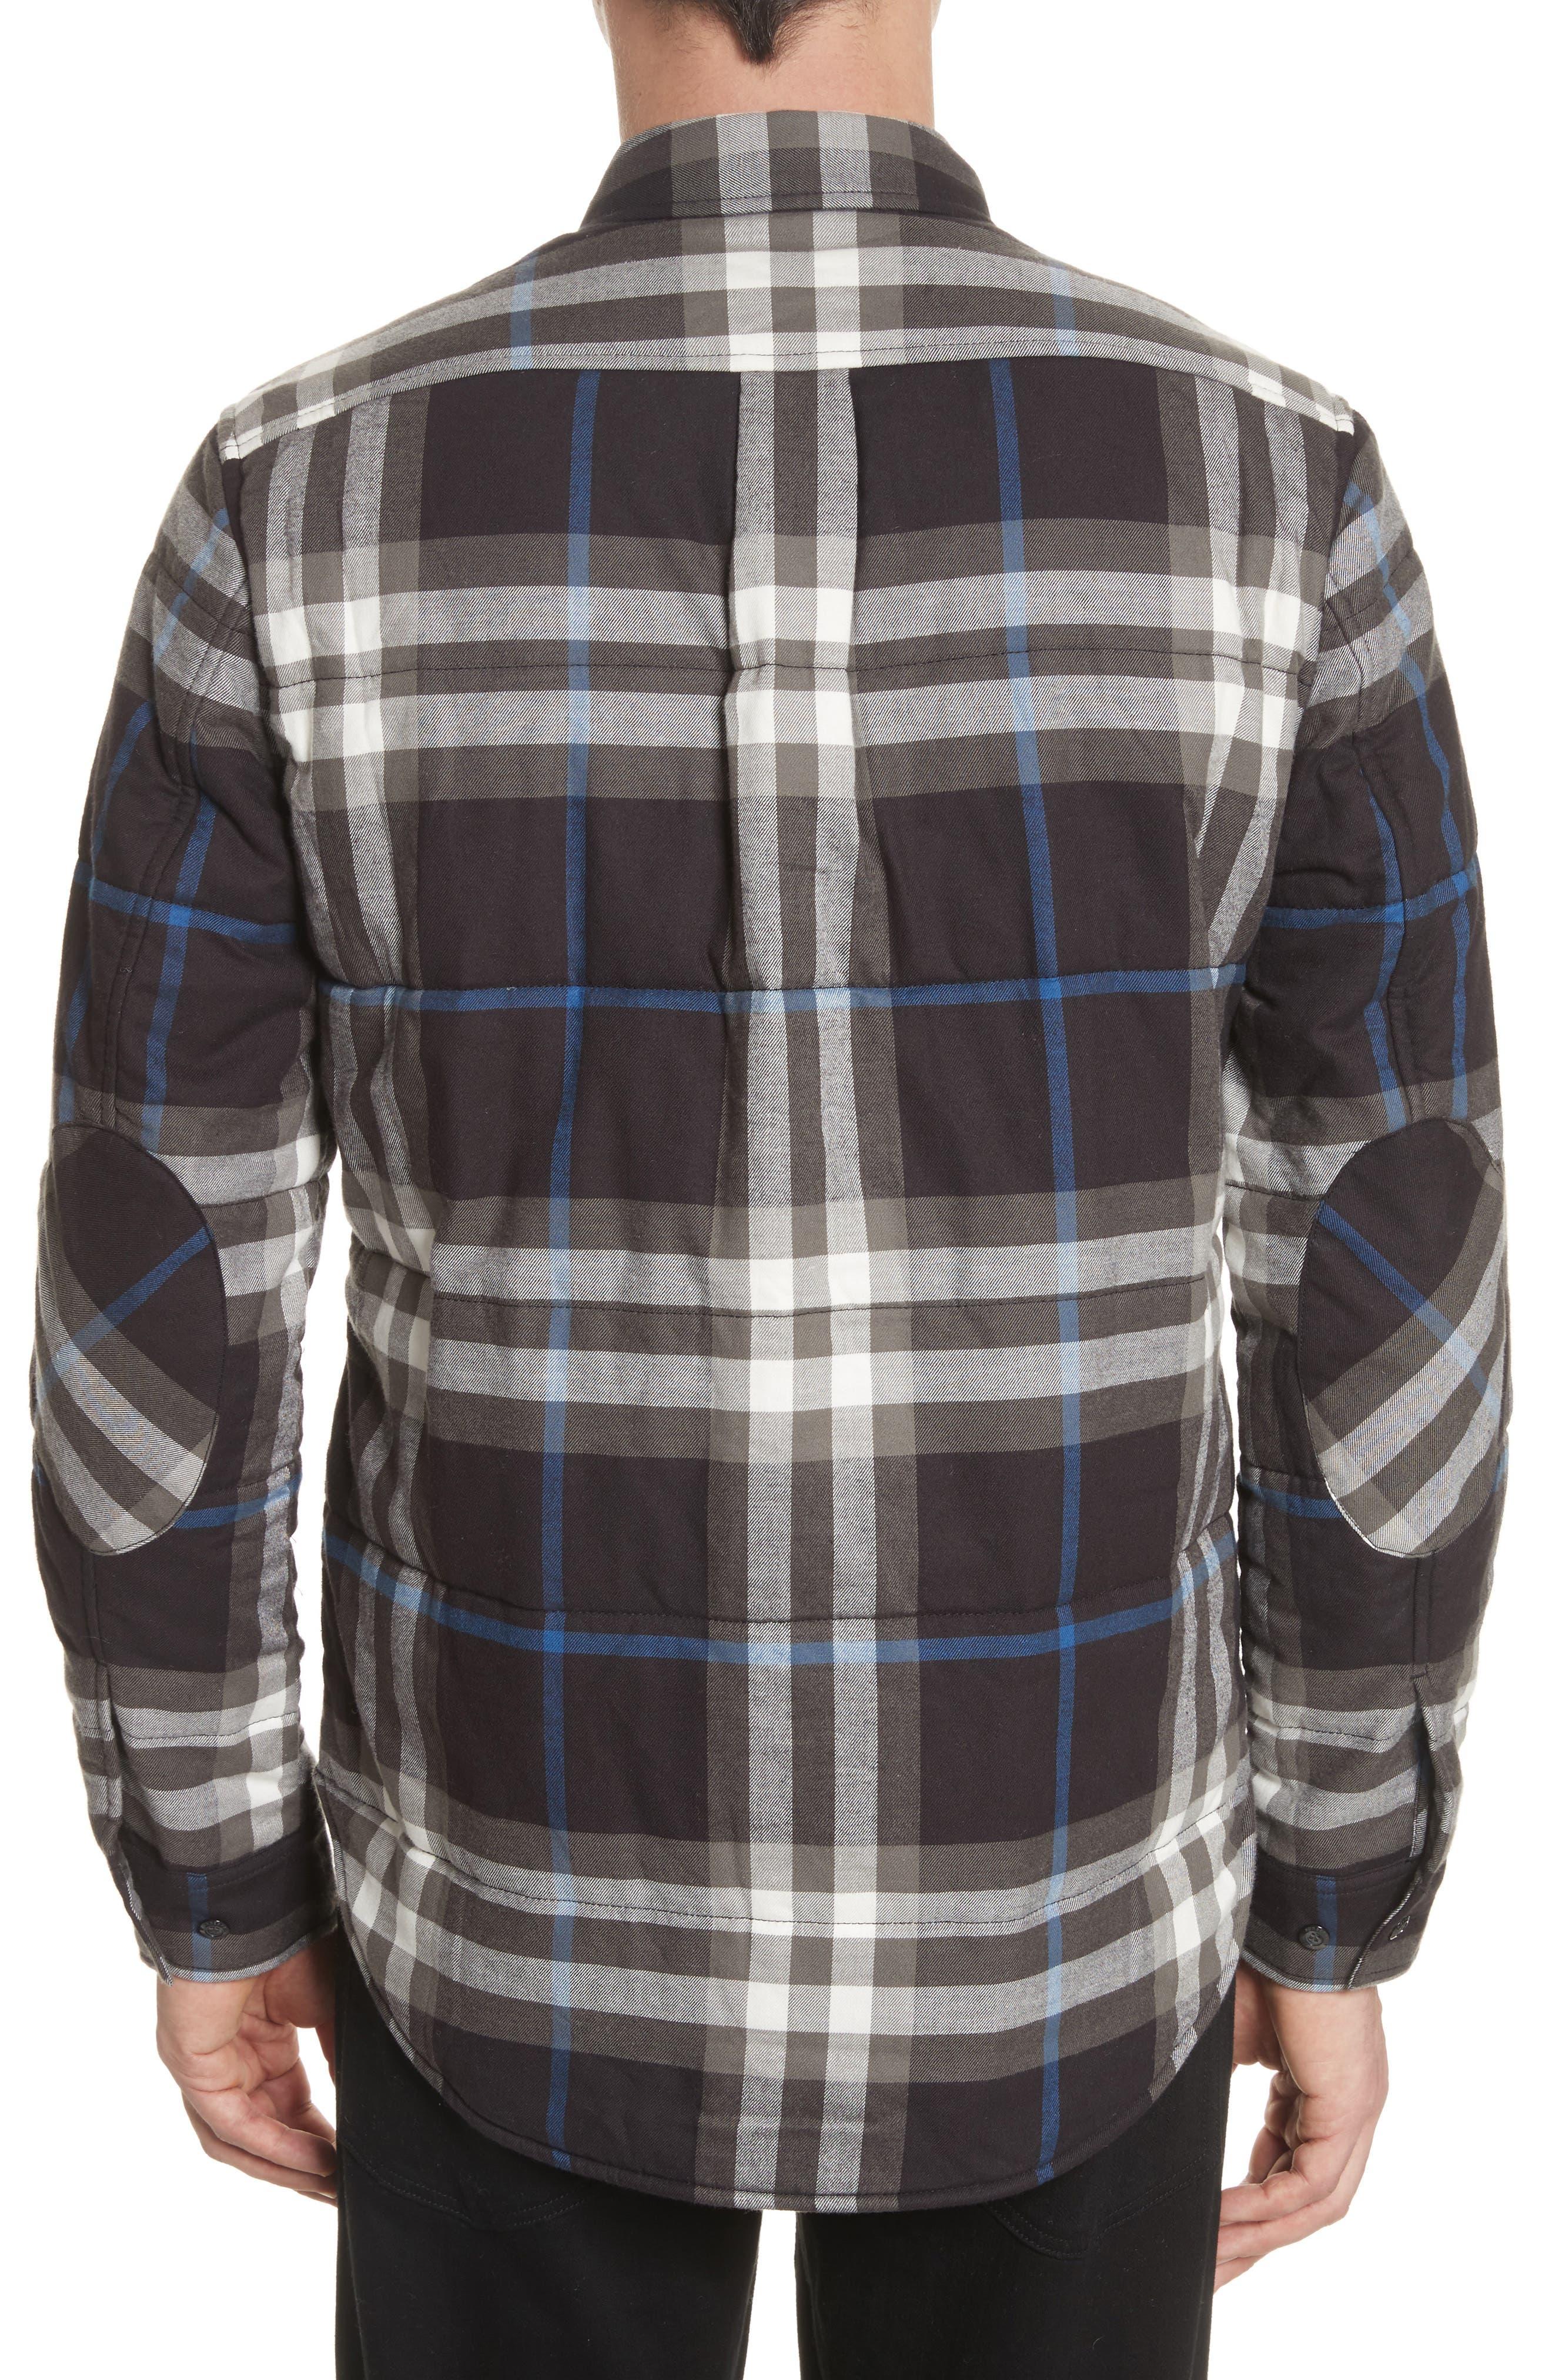 Walsden Plaid Flannel Shirt Jacket,                             Alternate thumbnail 3, color,                             001